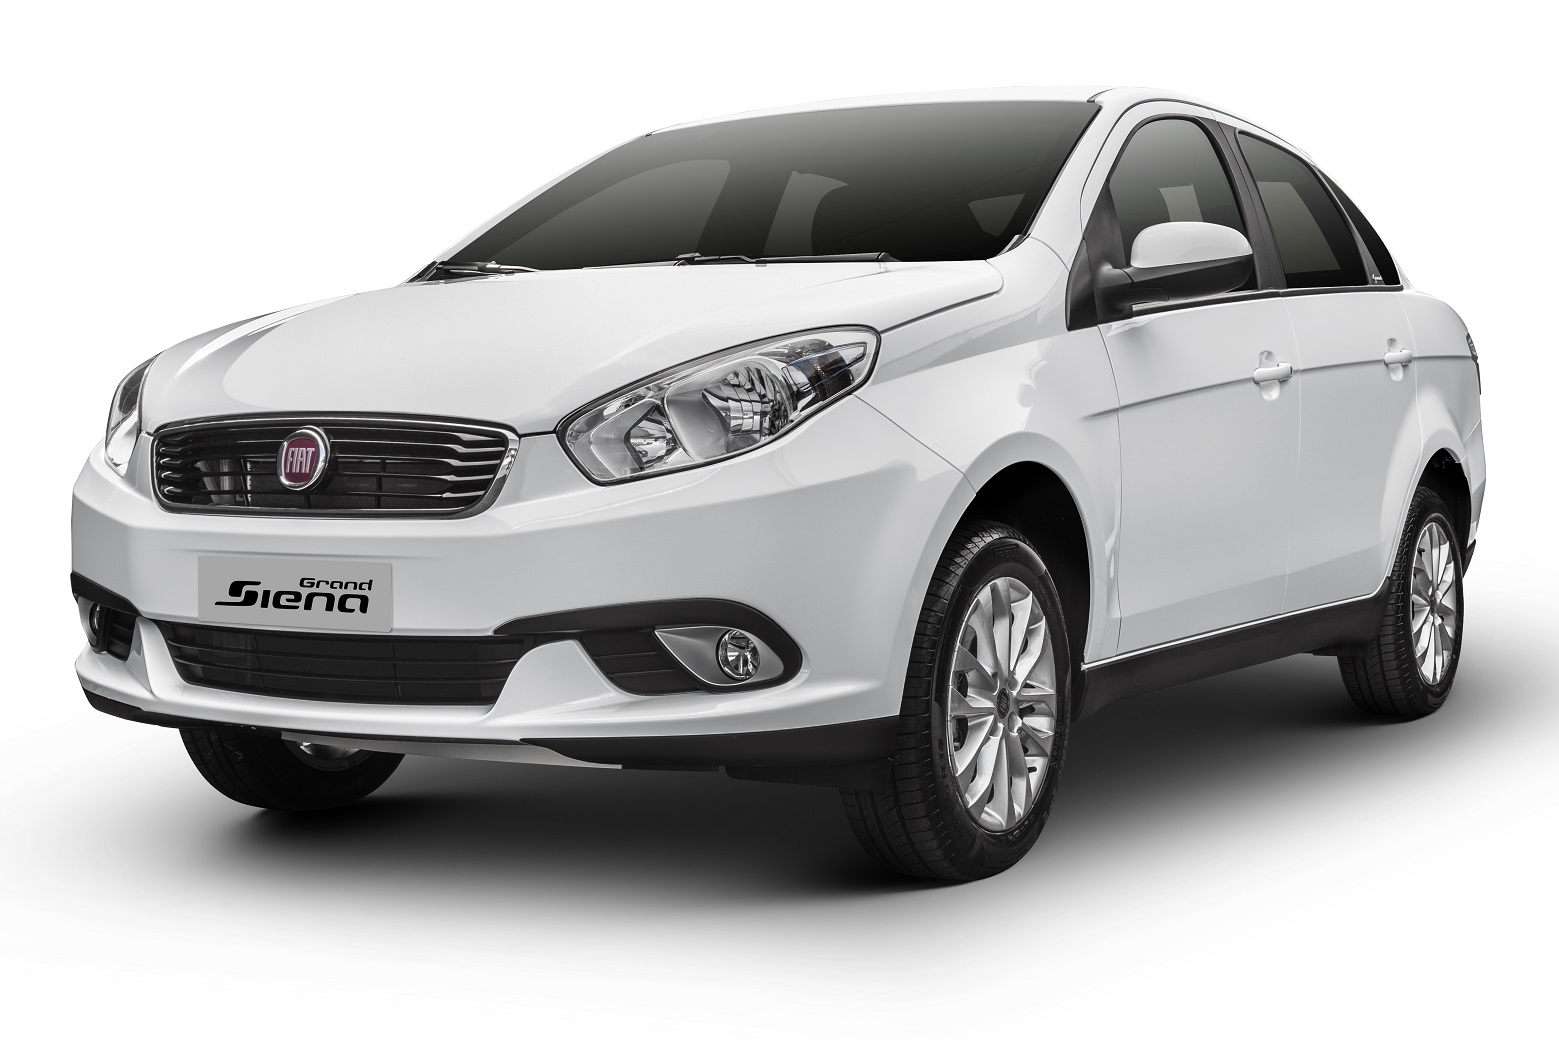 Carros PcD Fiat: Grand Siena Attractive 1.4 custa 39.190,48